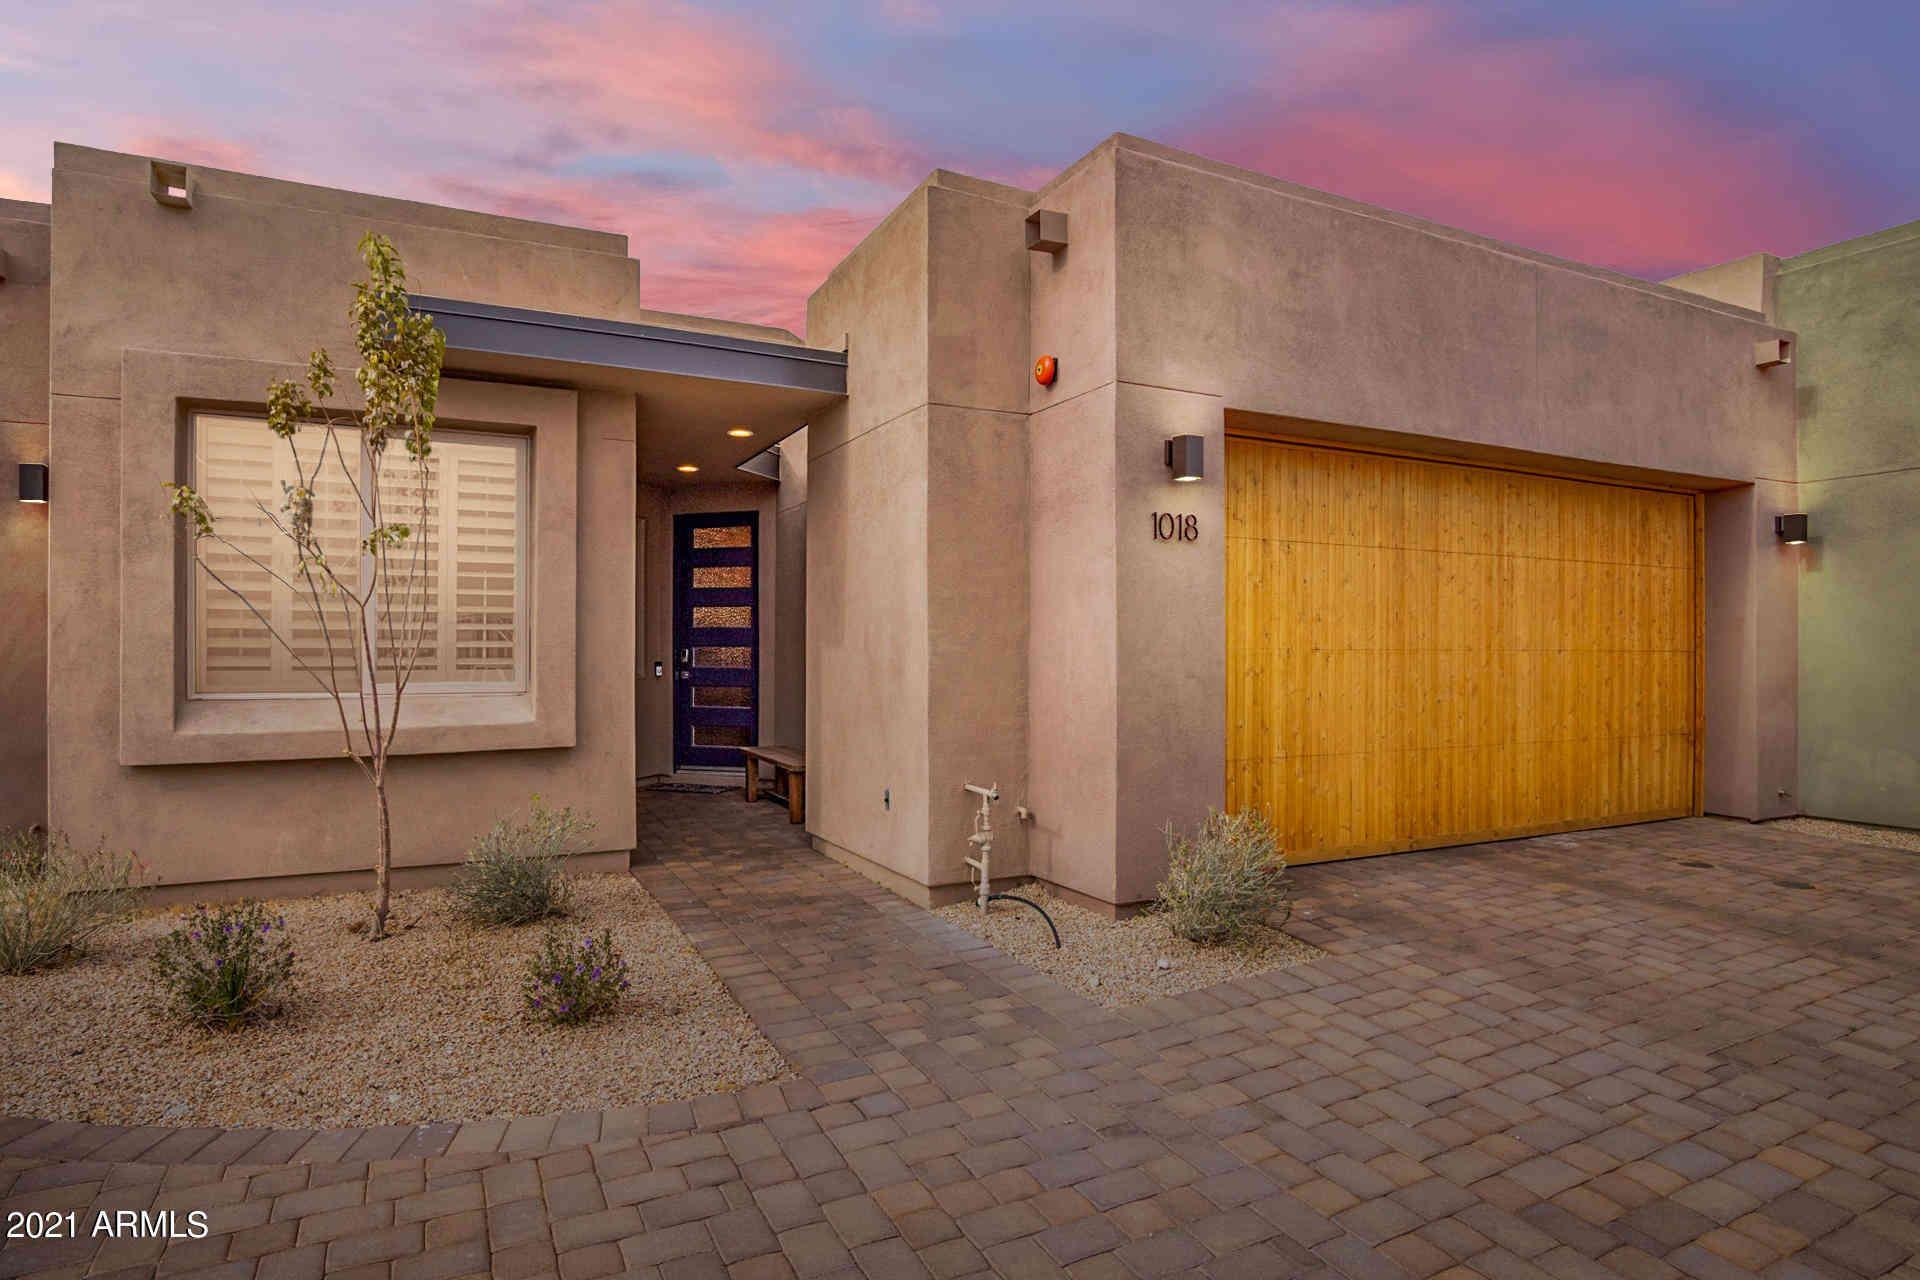 9850 E MCDOWELL MTN RANCH Road N #1018, Scottsdale, AZ, 85260,